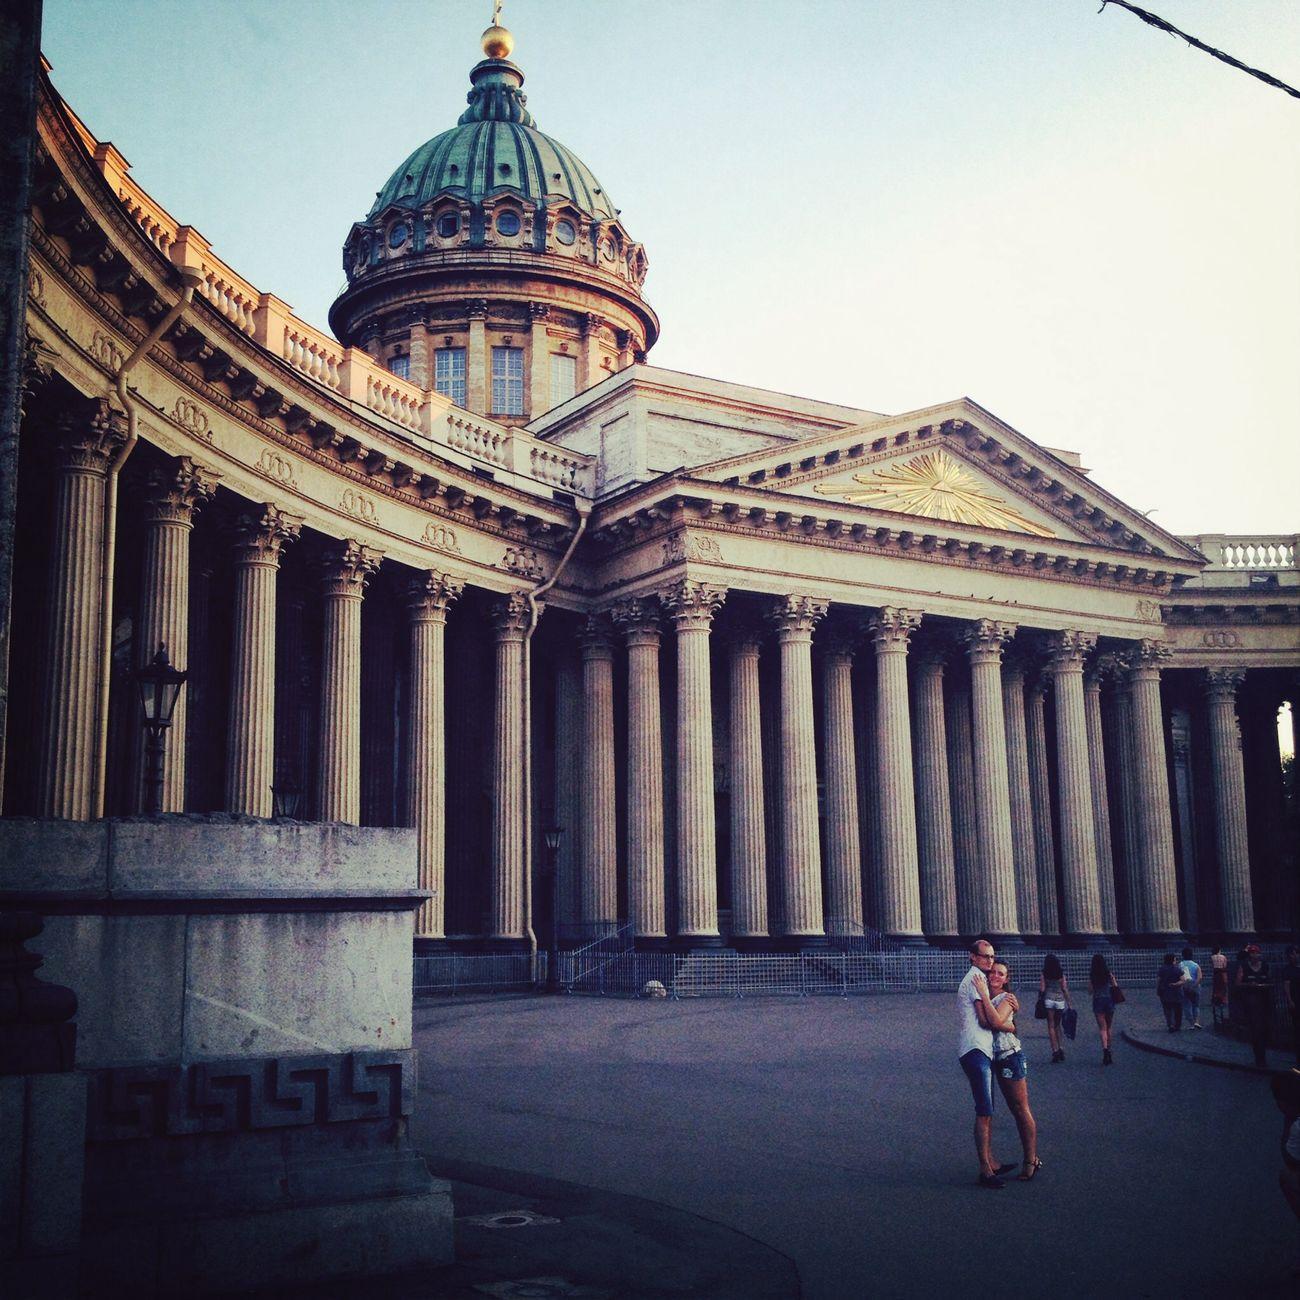 Time for adventure! казанский_собор Санкт-Петербург